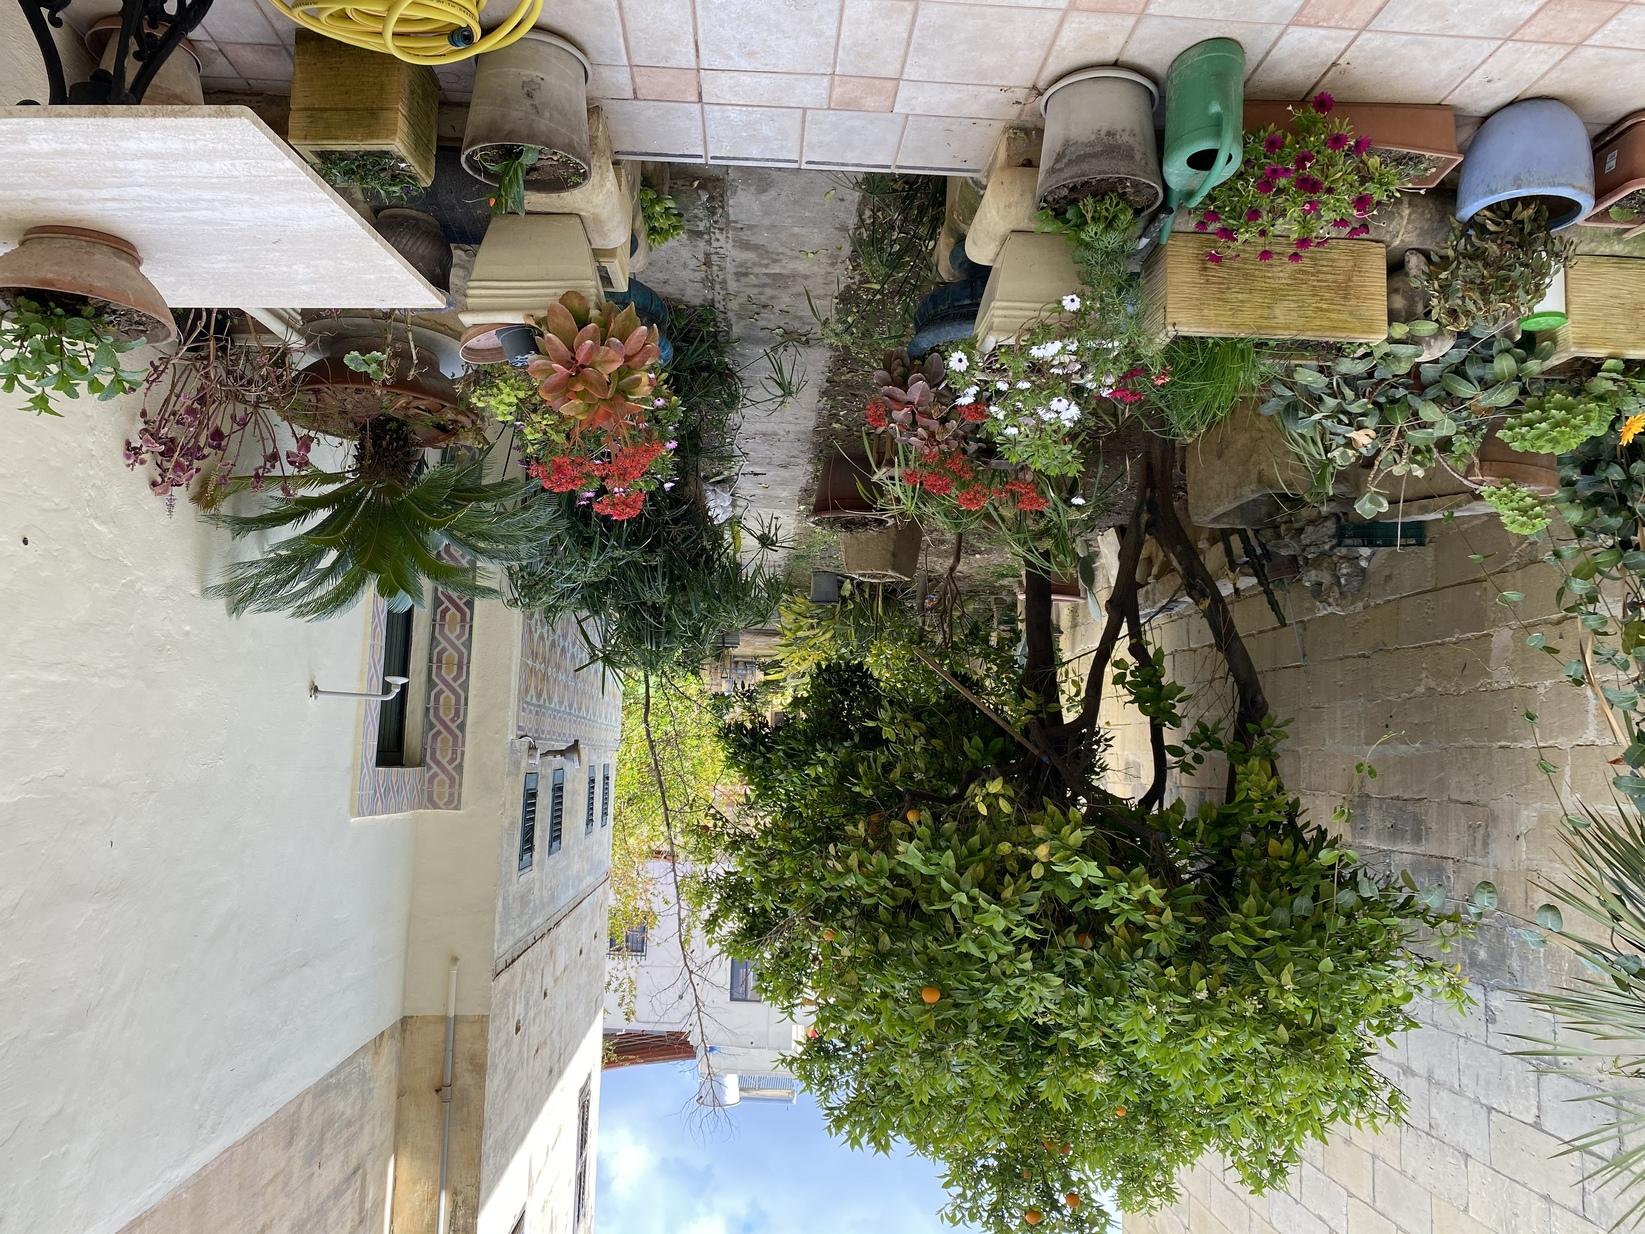 3 bed Terraced House For Sale in Santa Venera, Santa Venera - thumb 3